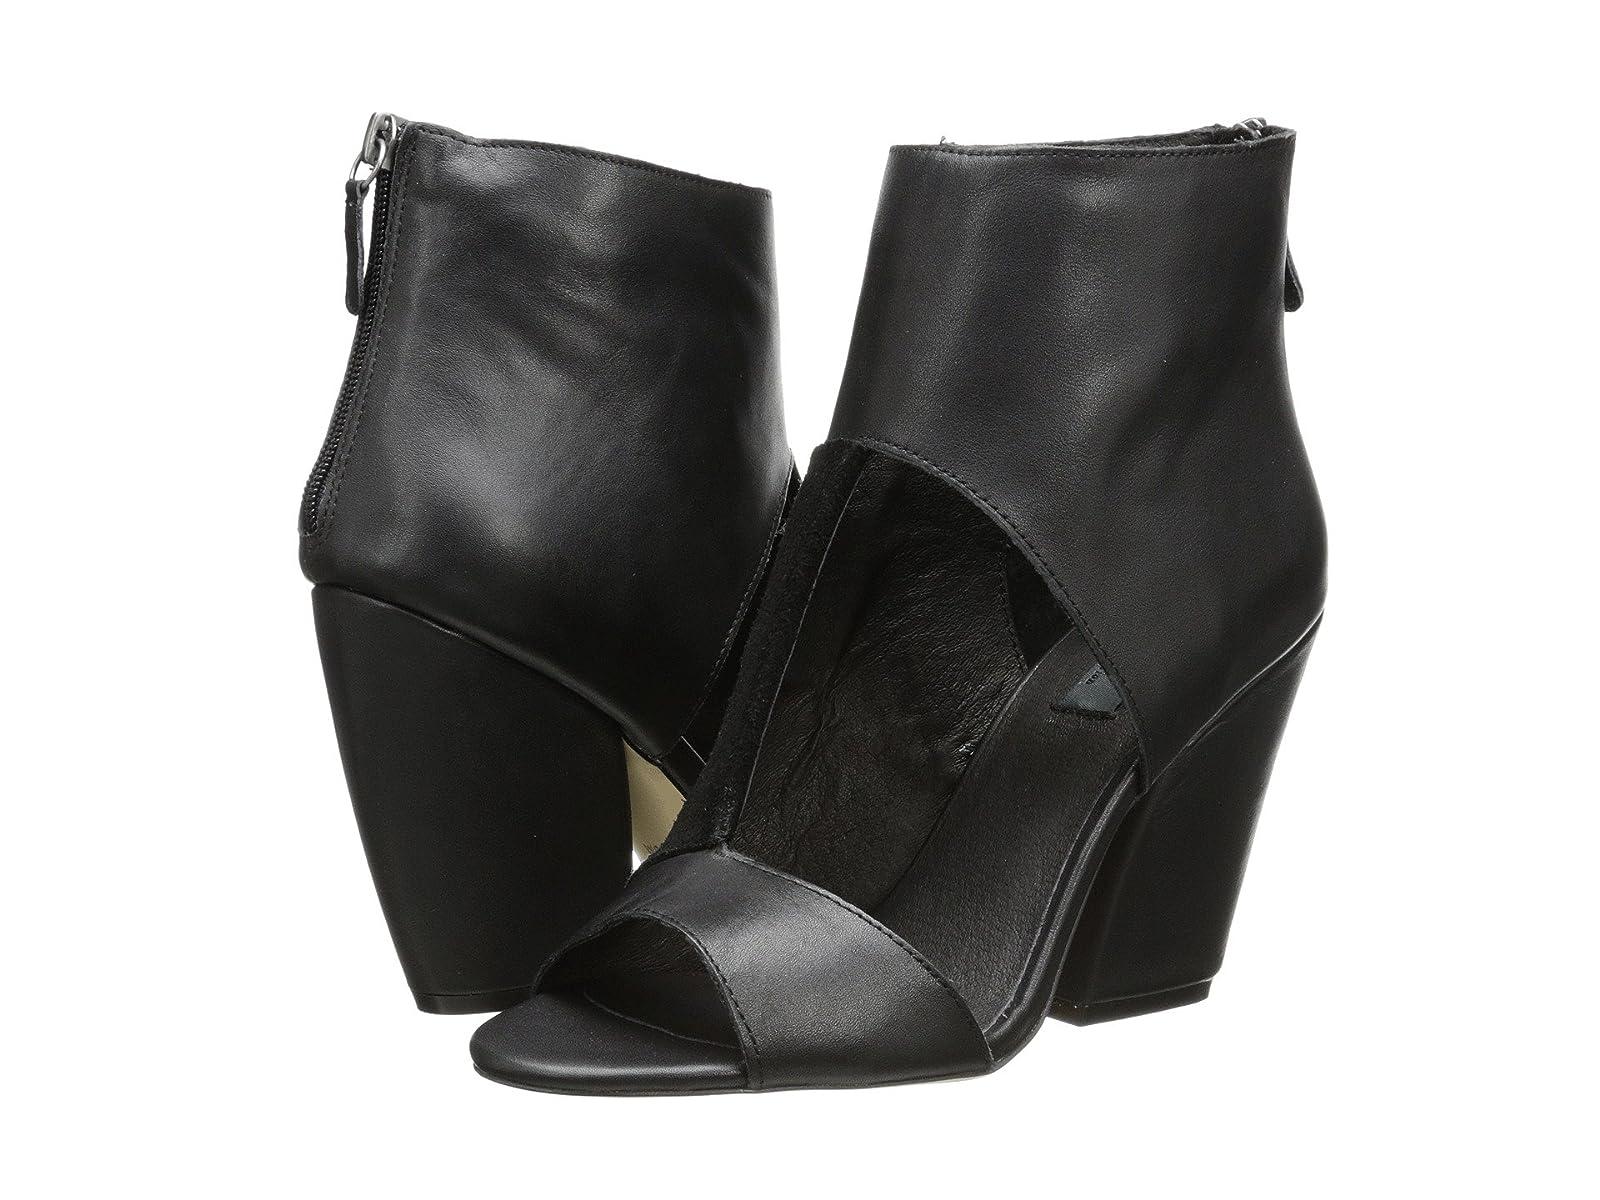 MIA MLE - RogueCheap and distinctive eye-catching shoes